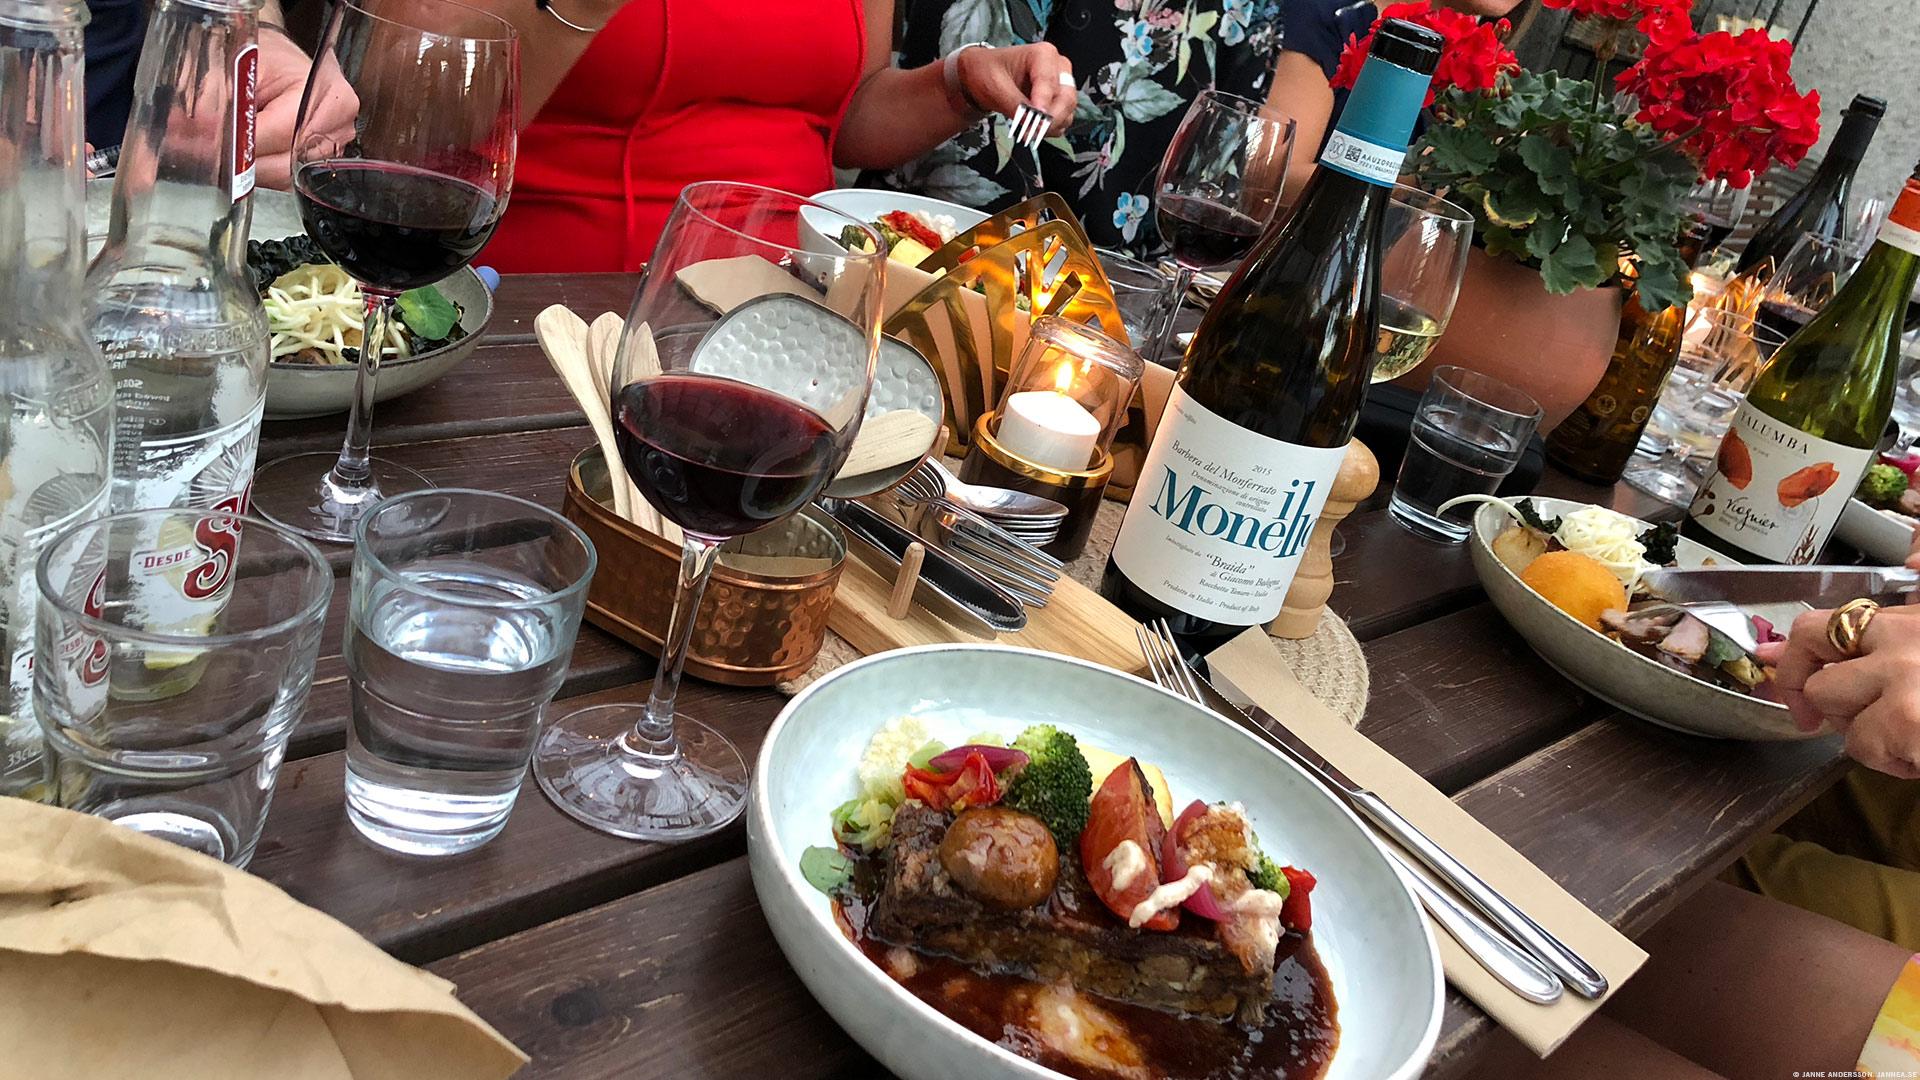 Middag på Hörnet, smaskig och god | © Janne A